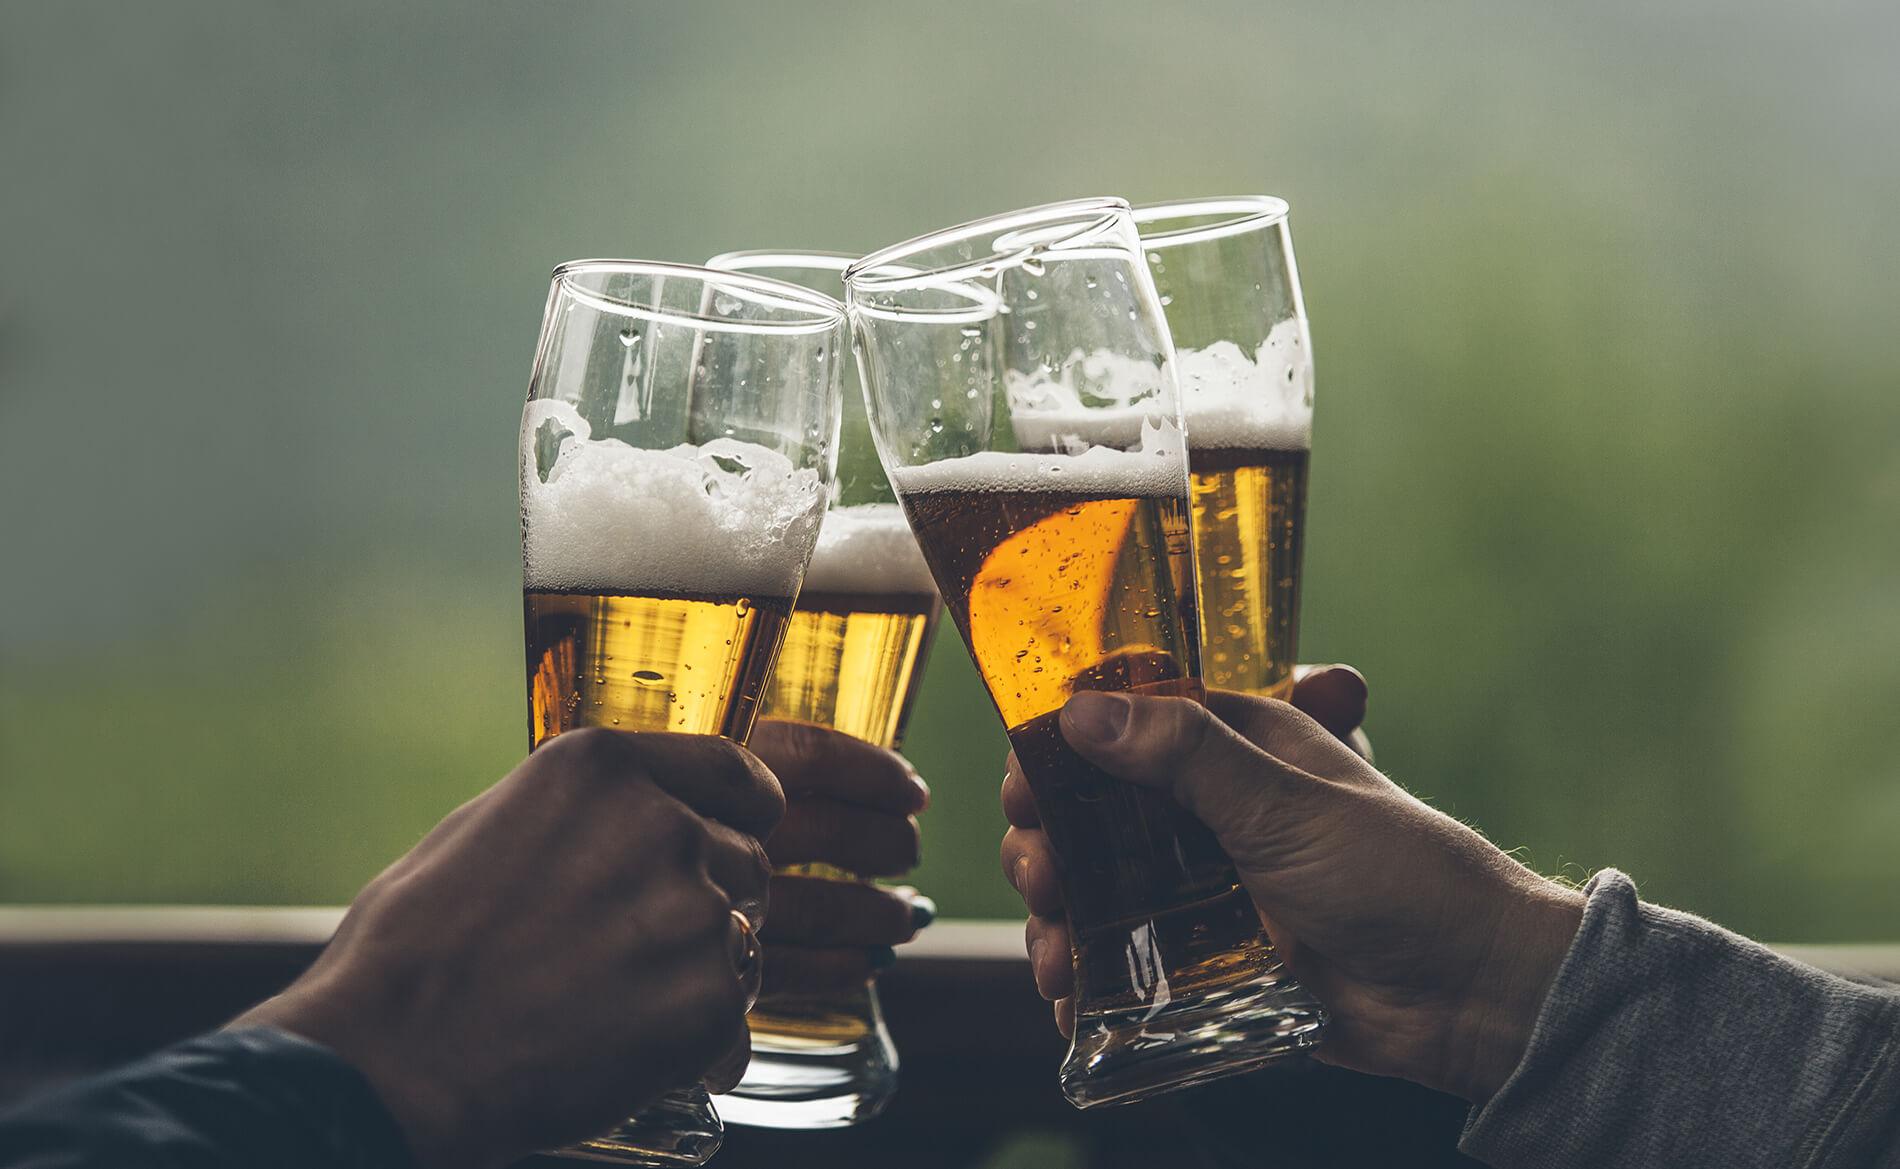 Schäfli Neuheim – Laxmanufaktur– News –Beer & Dine